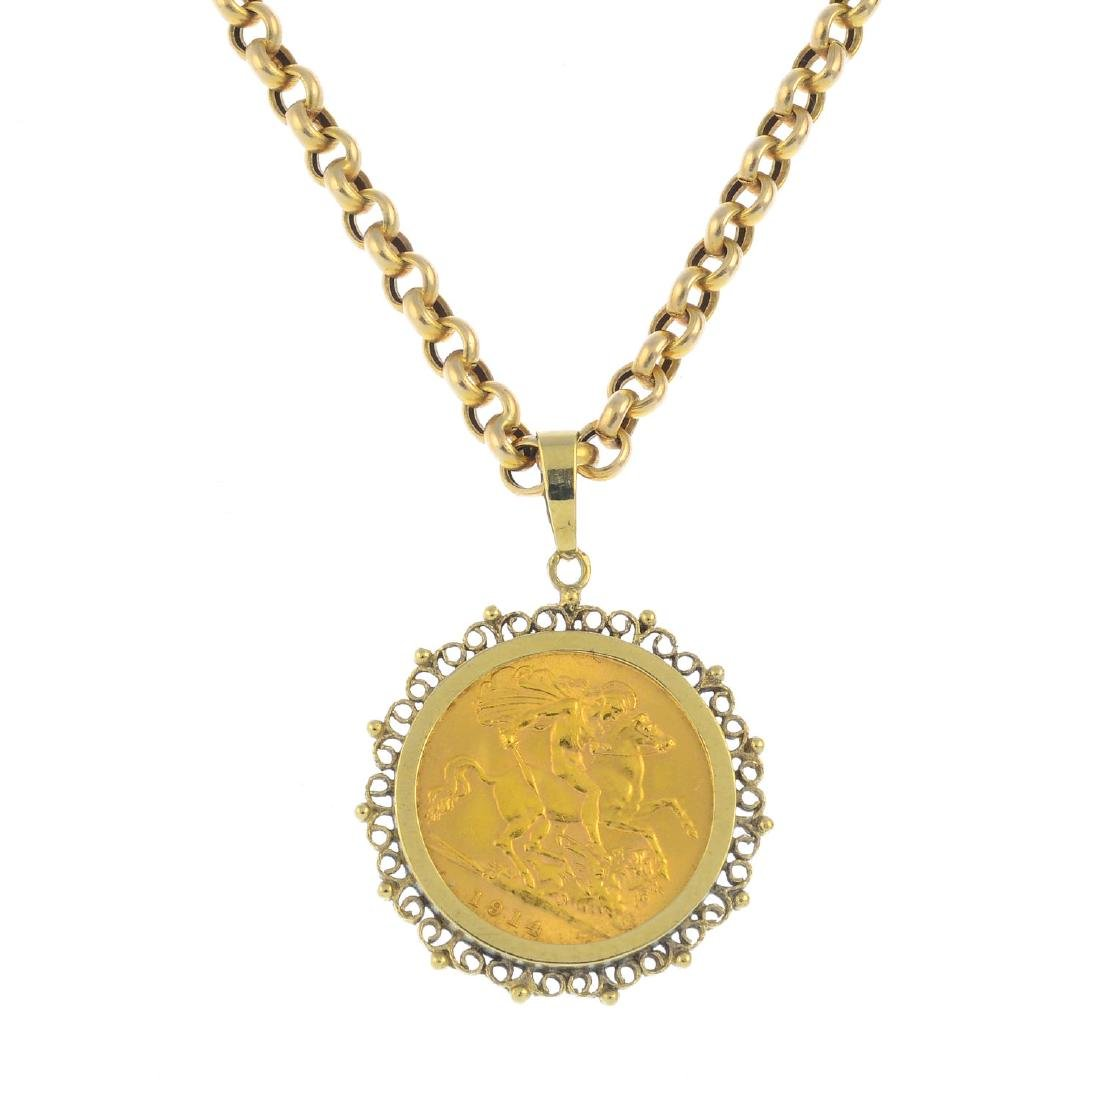 A 9ct gold half sovereign pendant. The half sovereign,